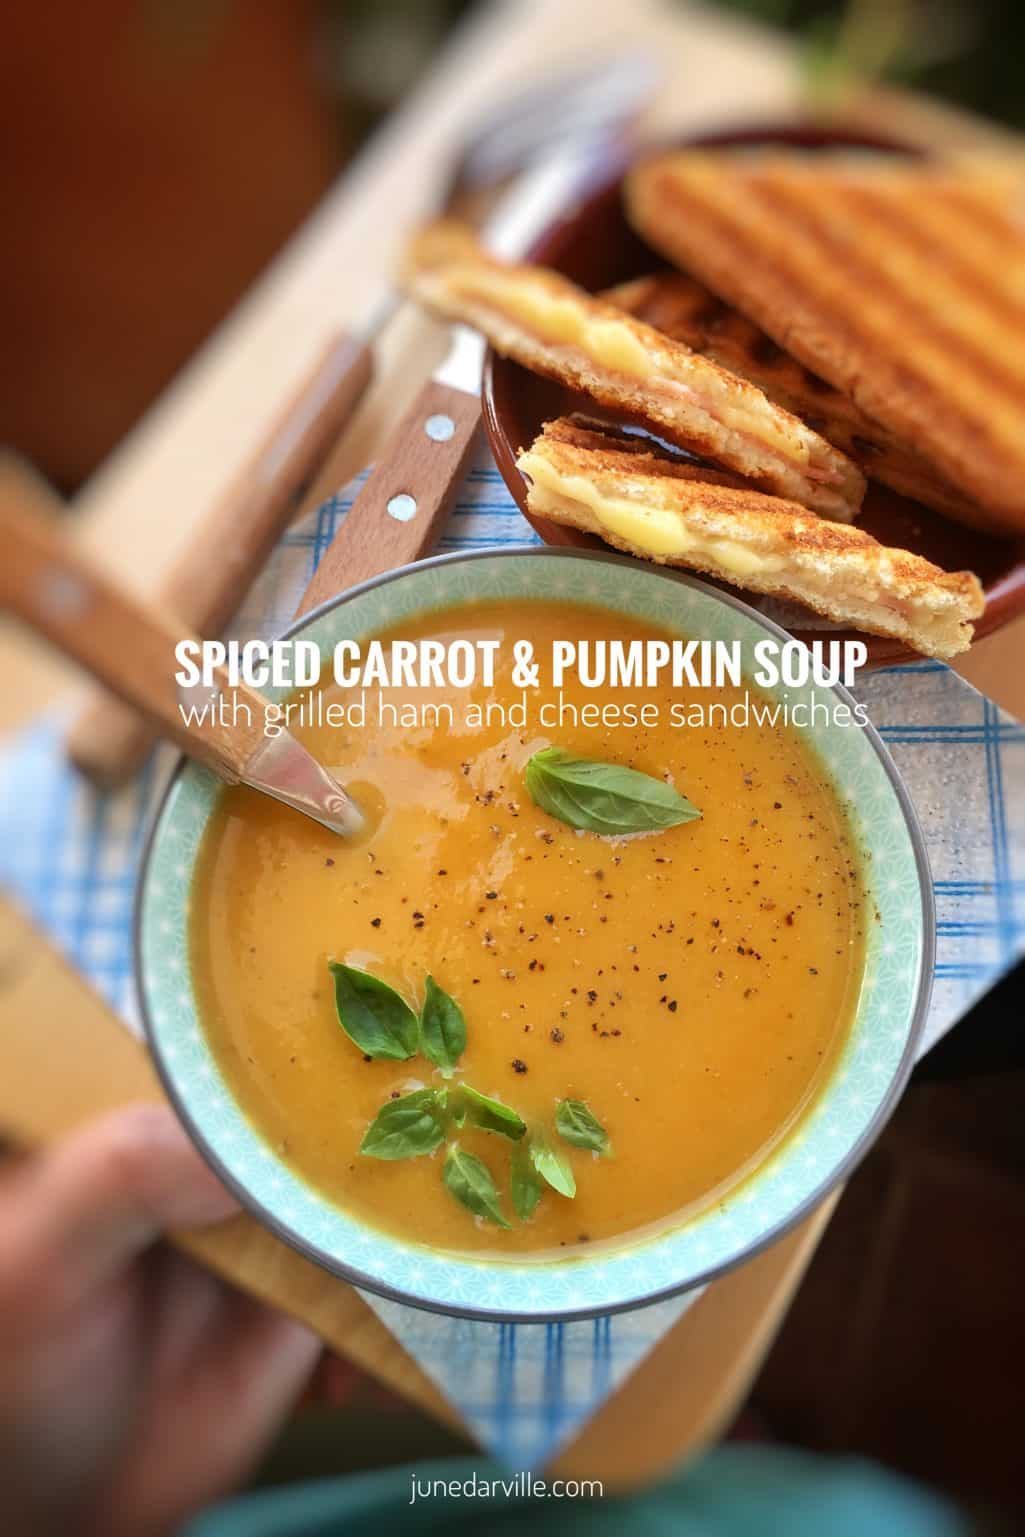 Carrot Pumpkin Soup with Ham & Cheese Sammies